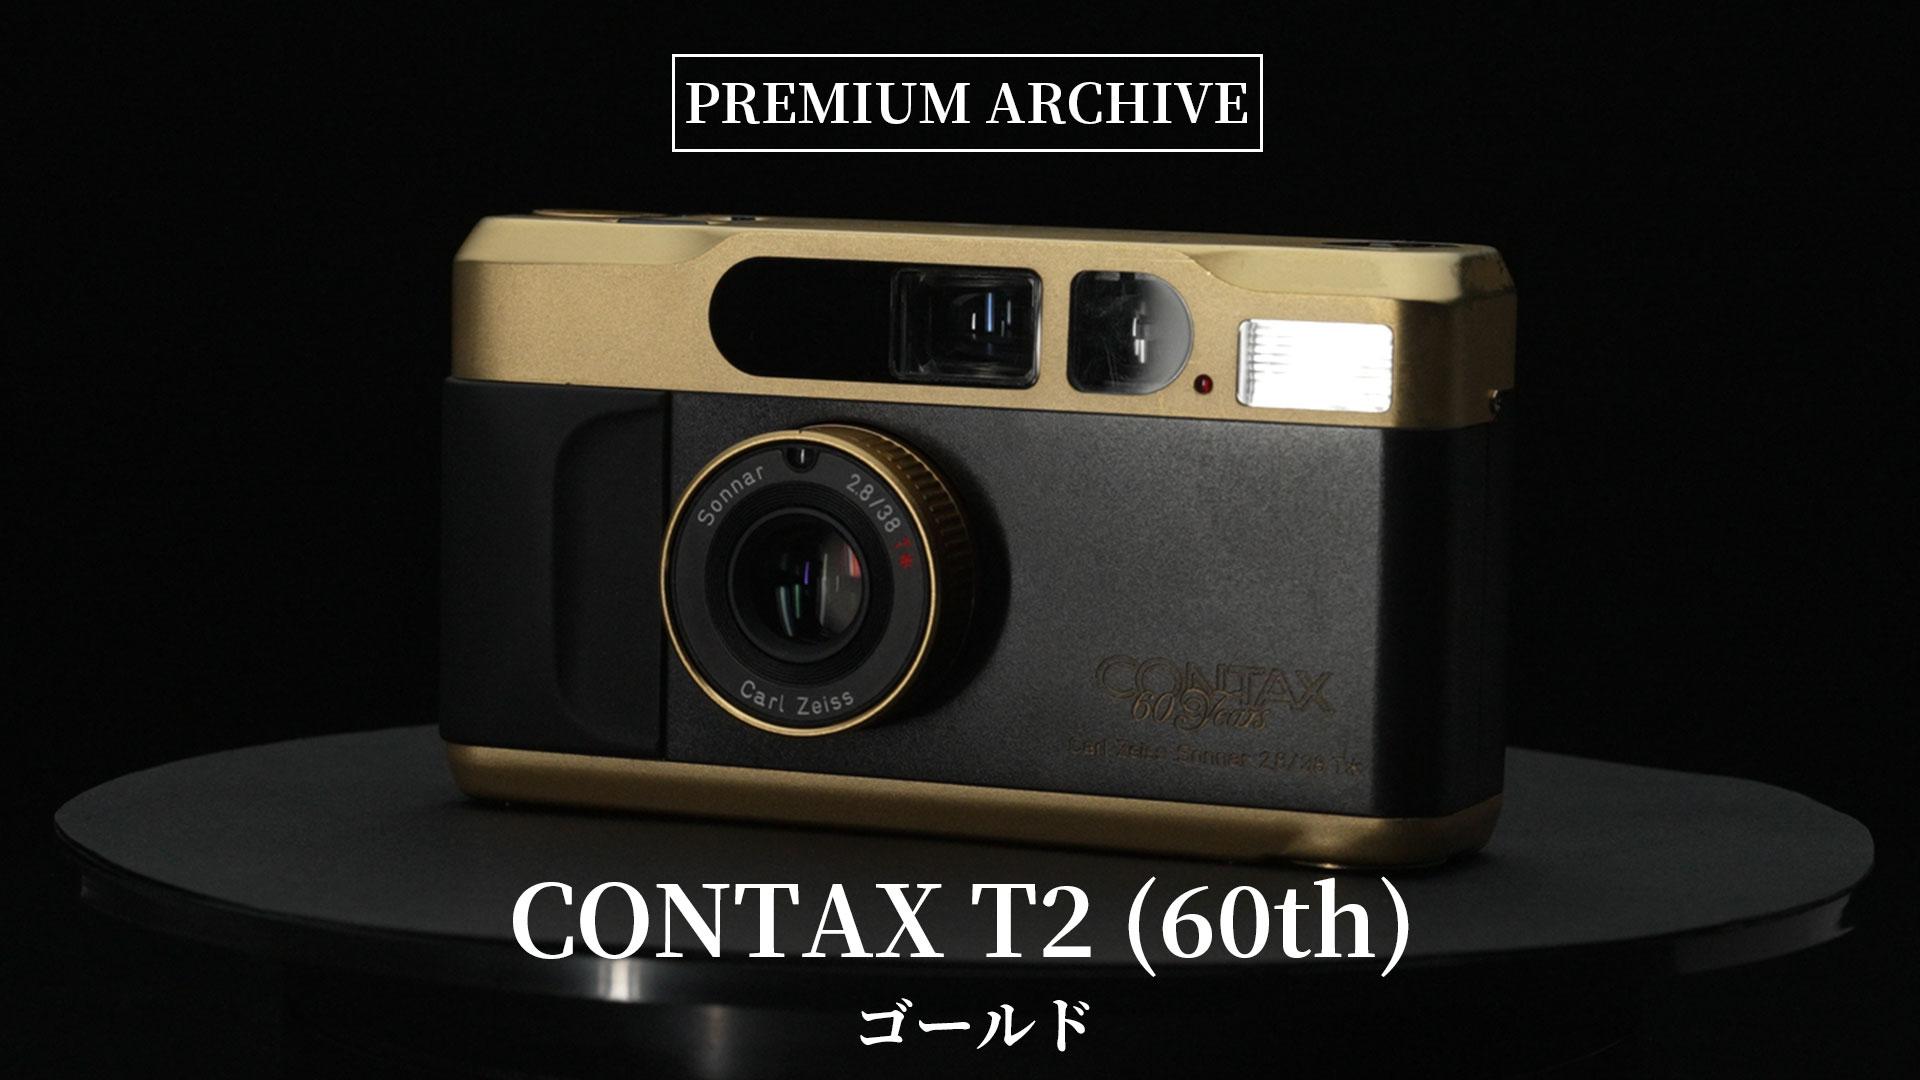 【PREMIUM ARCHIVE #15】CONTAX T2 60th Gold